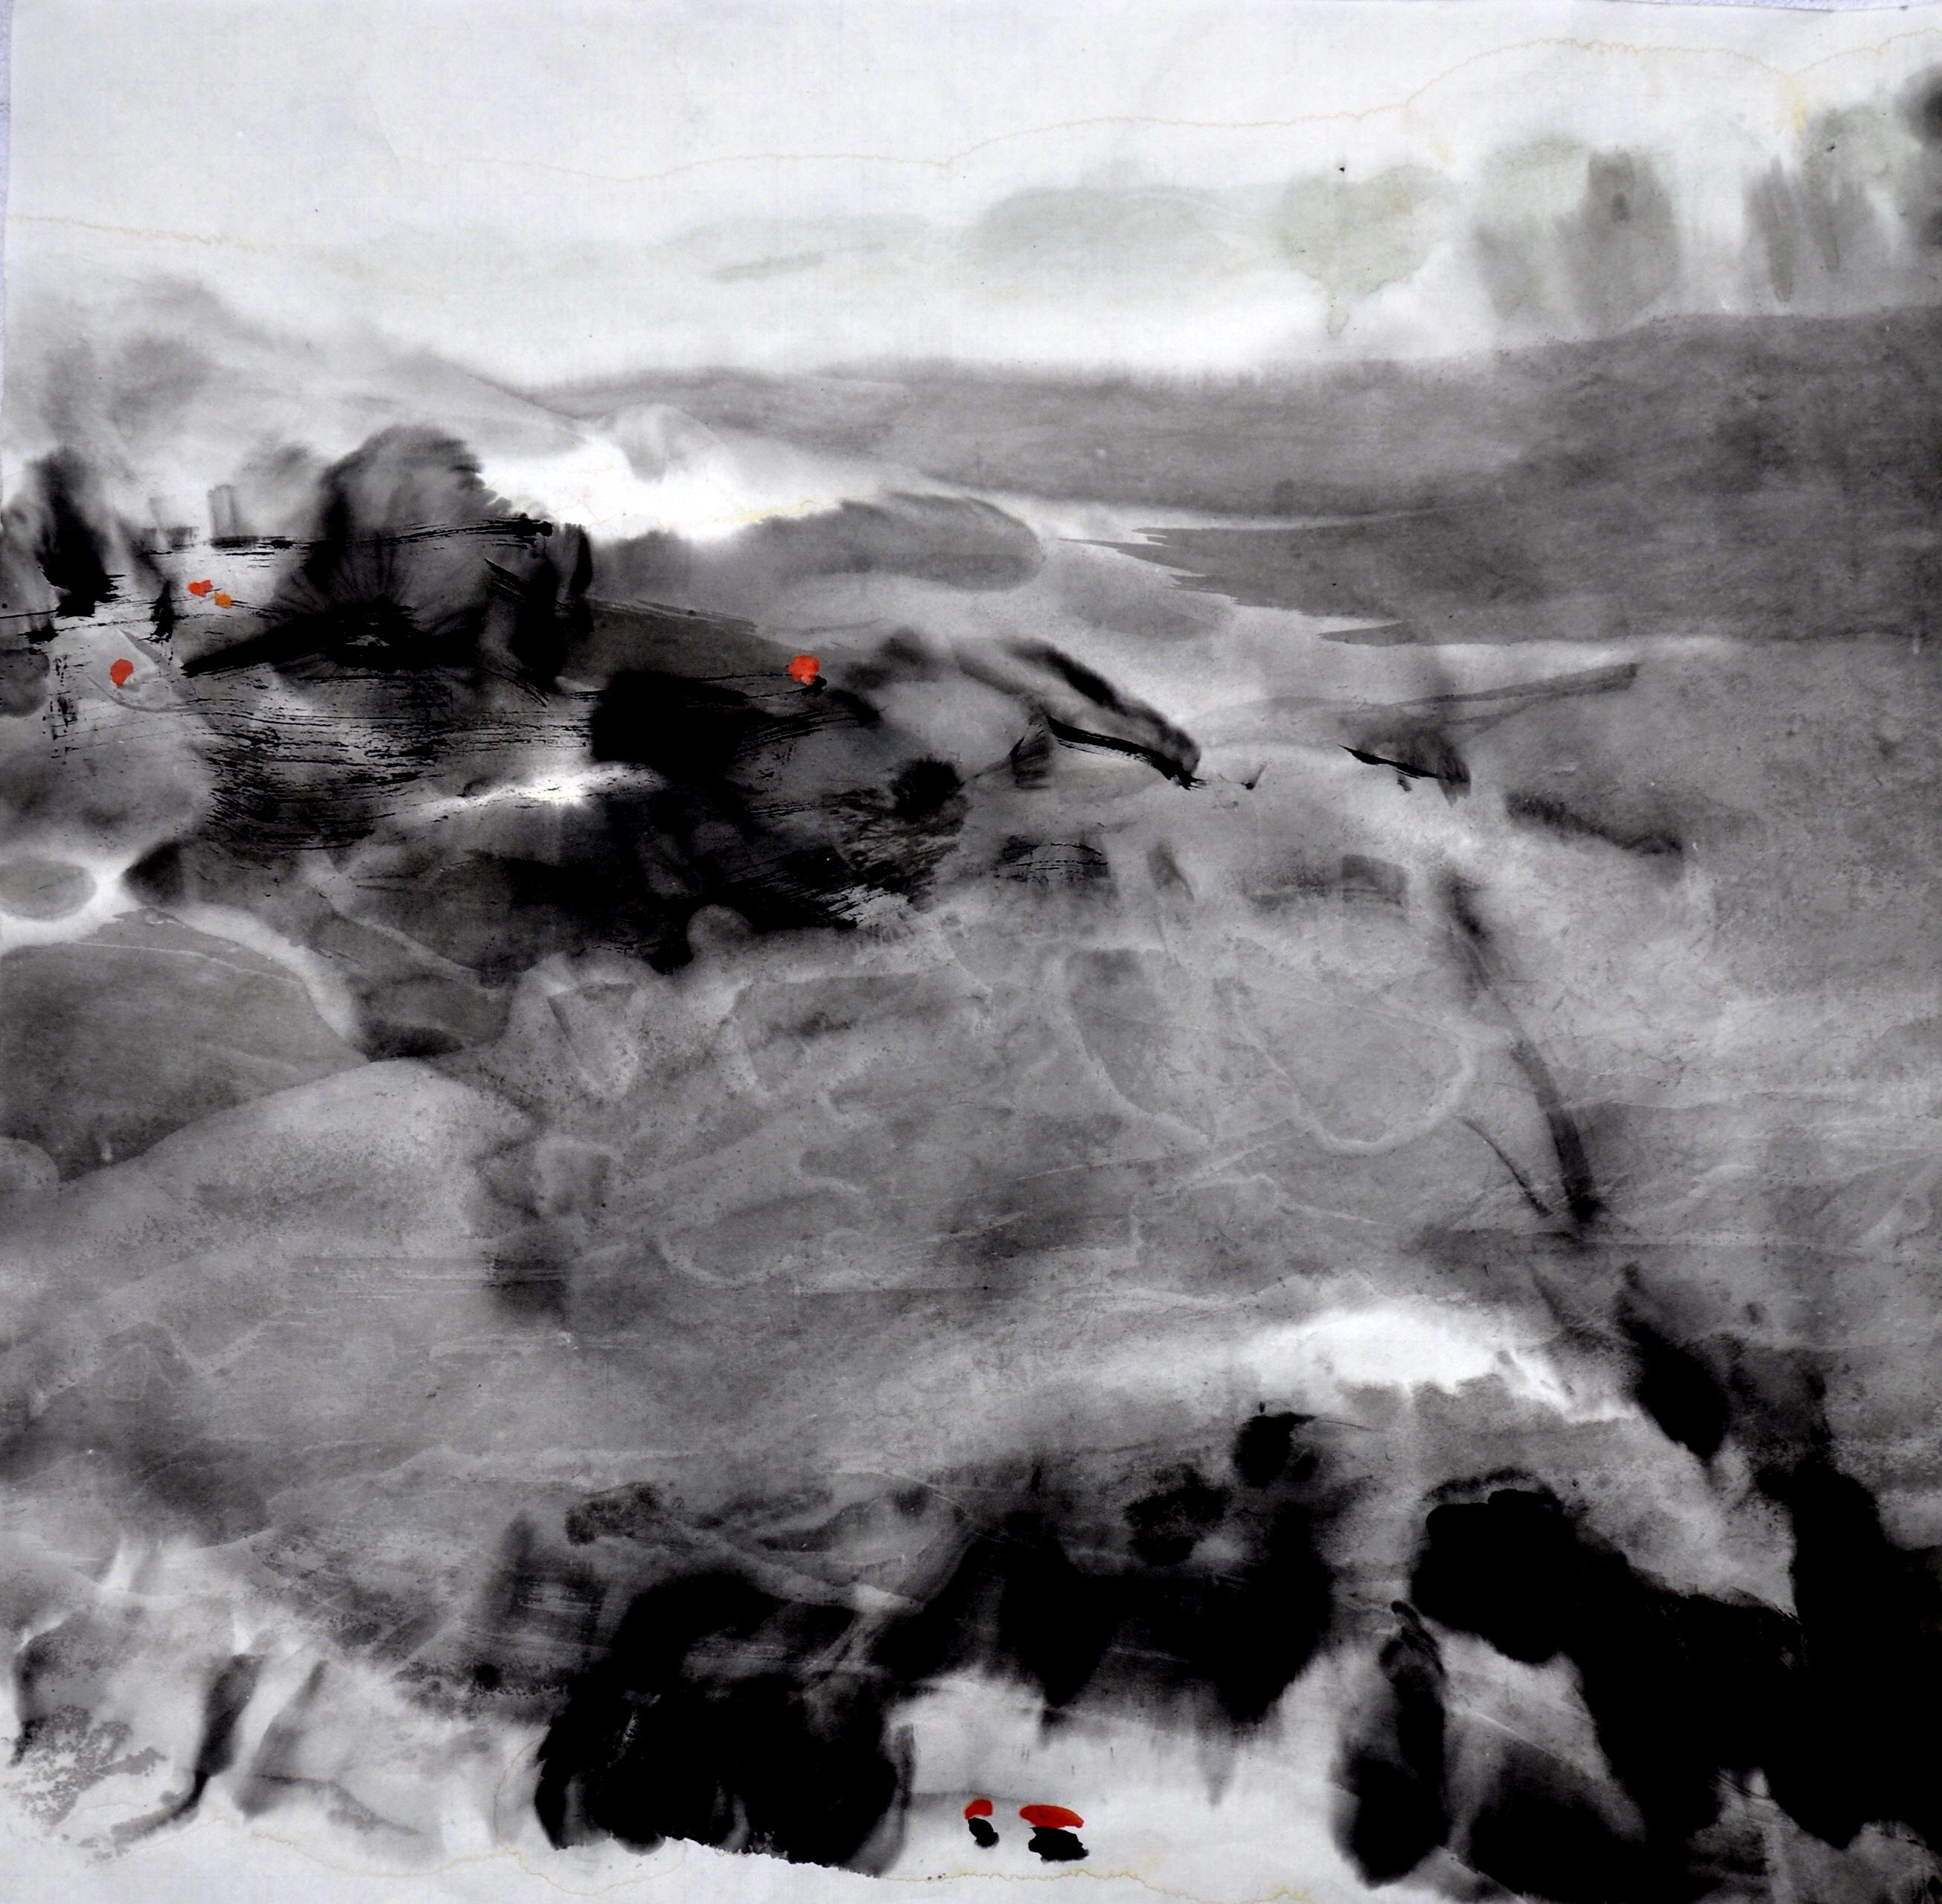 2013 山路湾湾         Chemins  sinueux de montagne      68 x 68